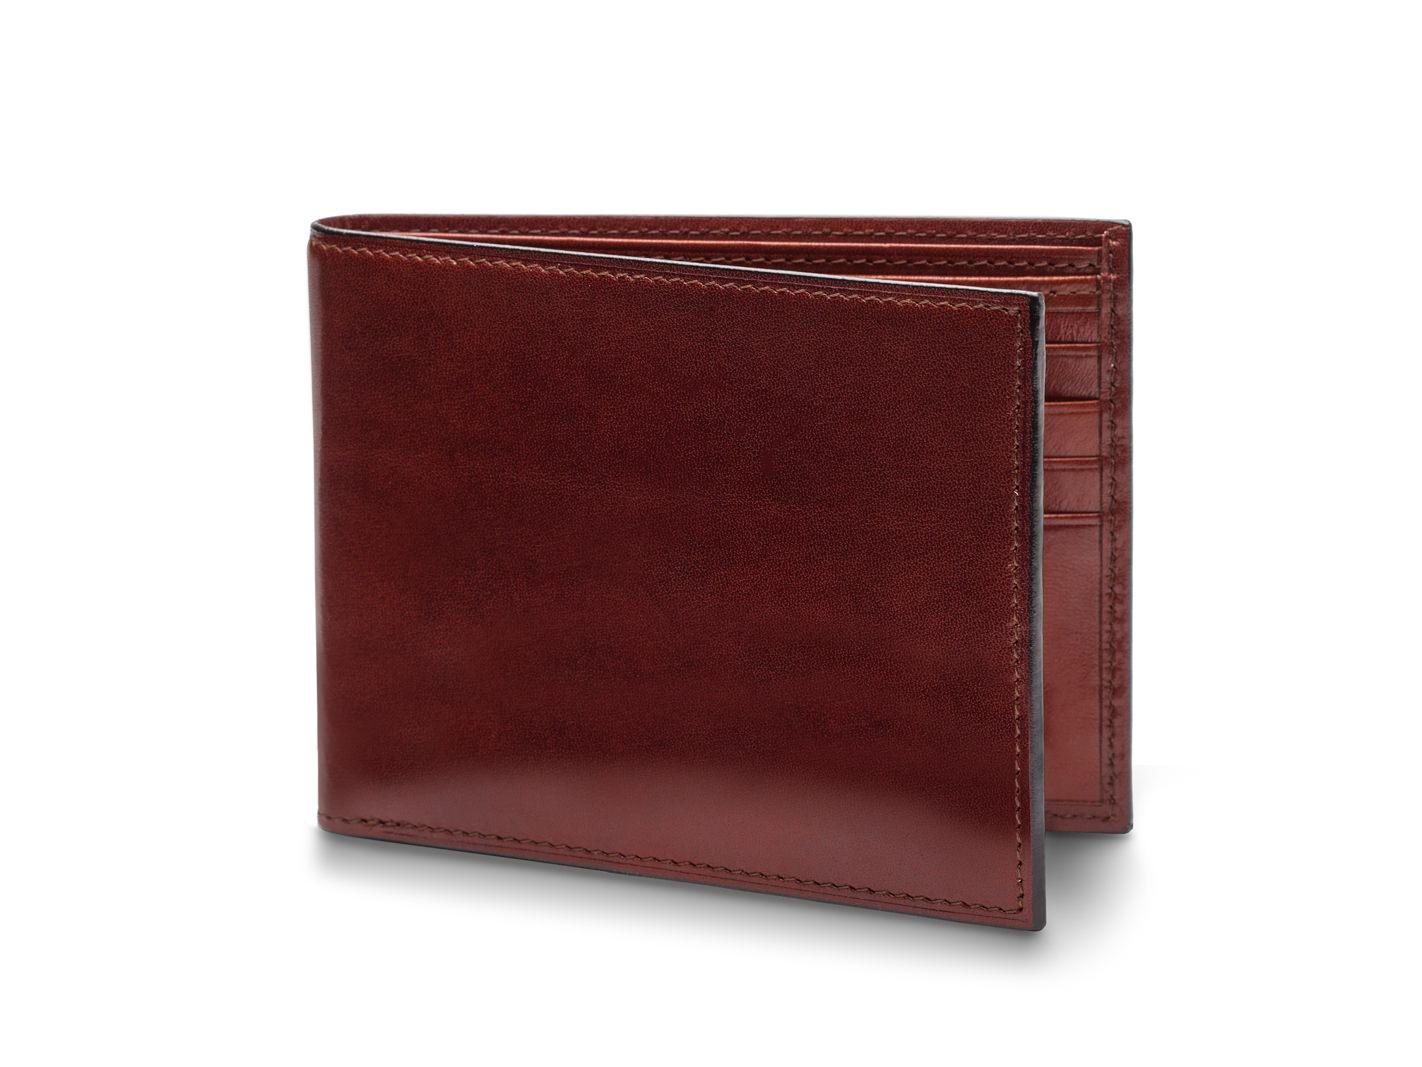 8 Pocket Wallet - 58 Dark Brown